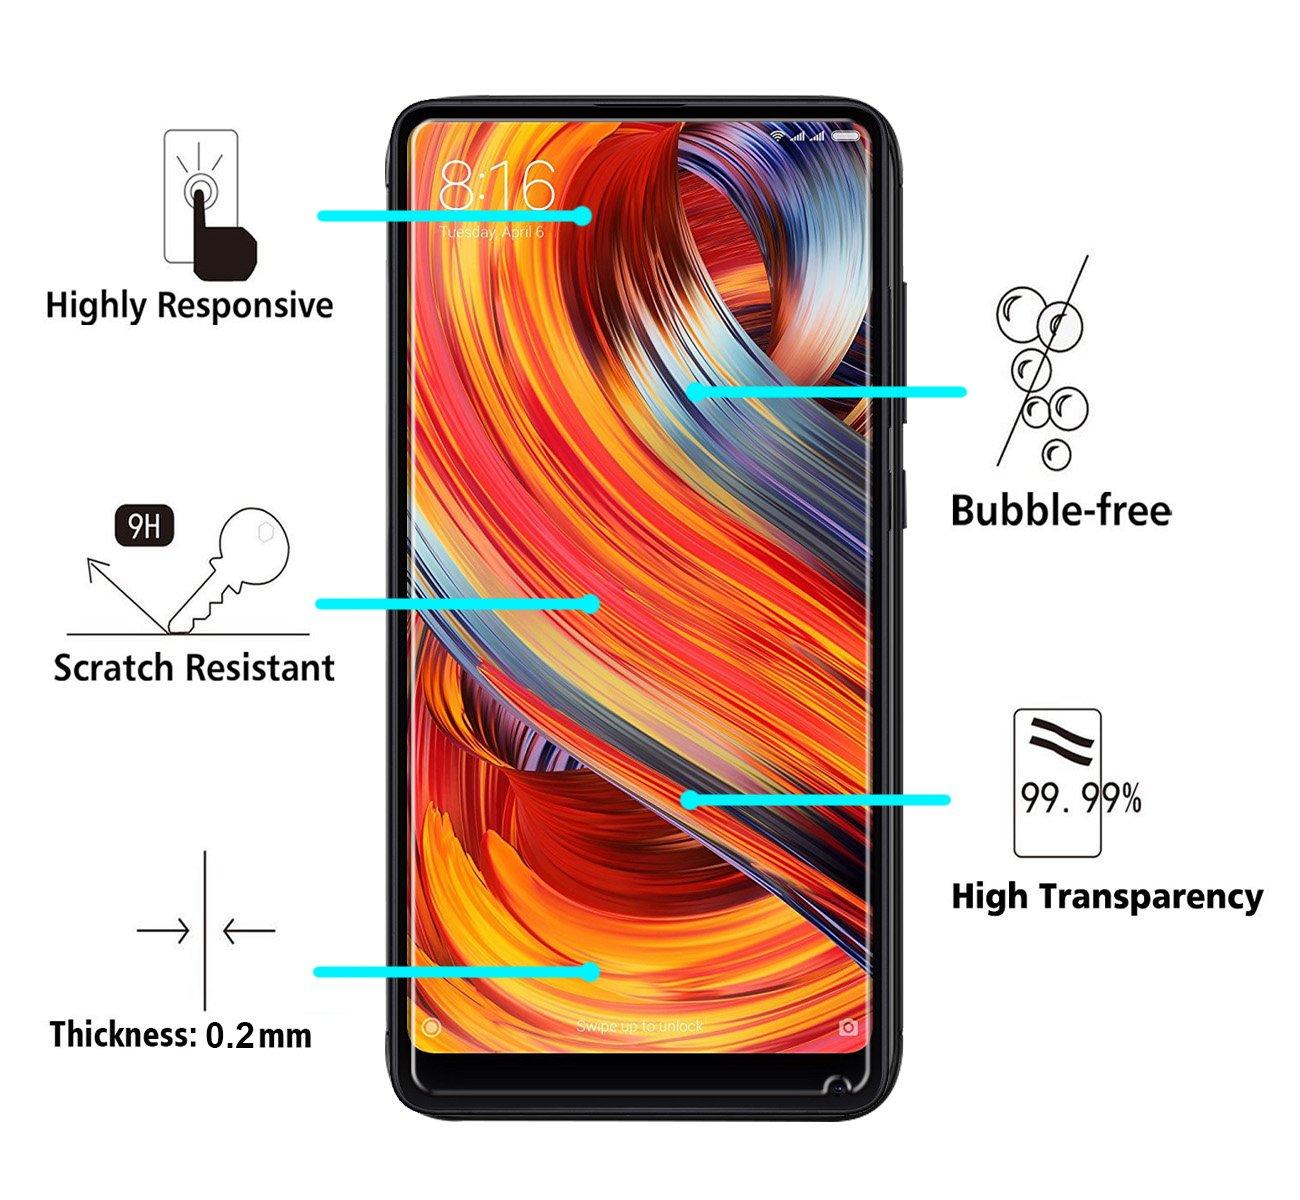 iVoler [2 Unidades] Protector de Pantalla para Xiaomi Mi Mix 2 / Xiaomi Mi Mix 2s, Cristal Vidrio Templado Premium: Amazon.es: Electrónica